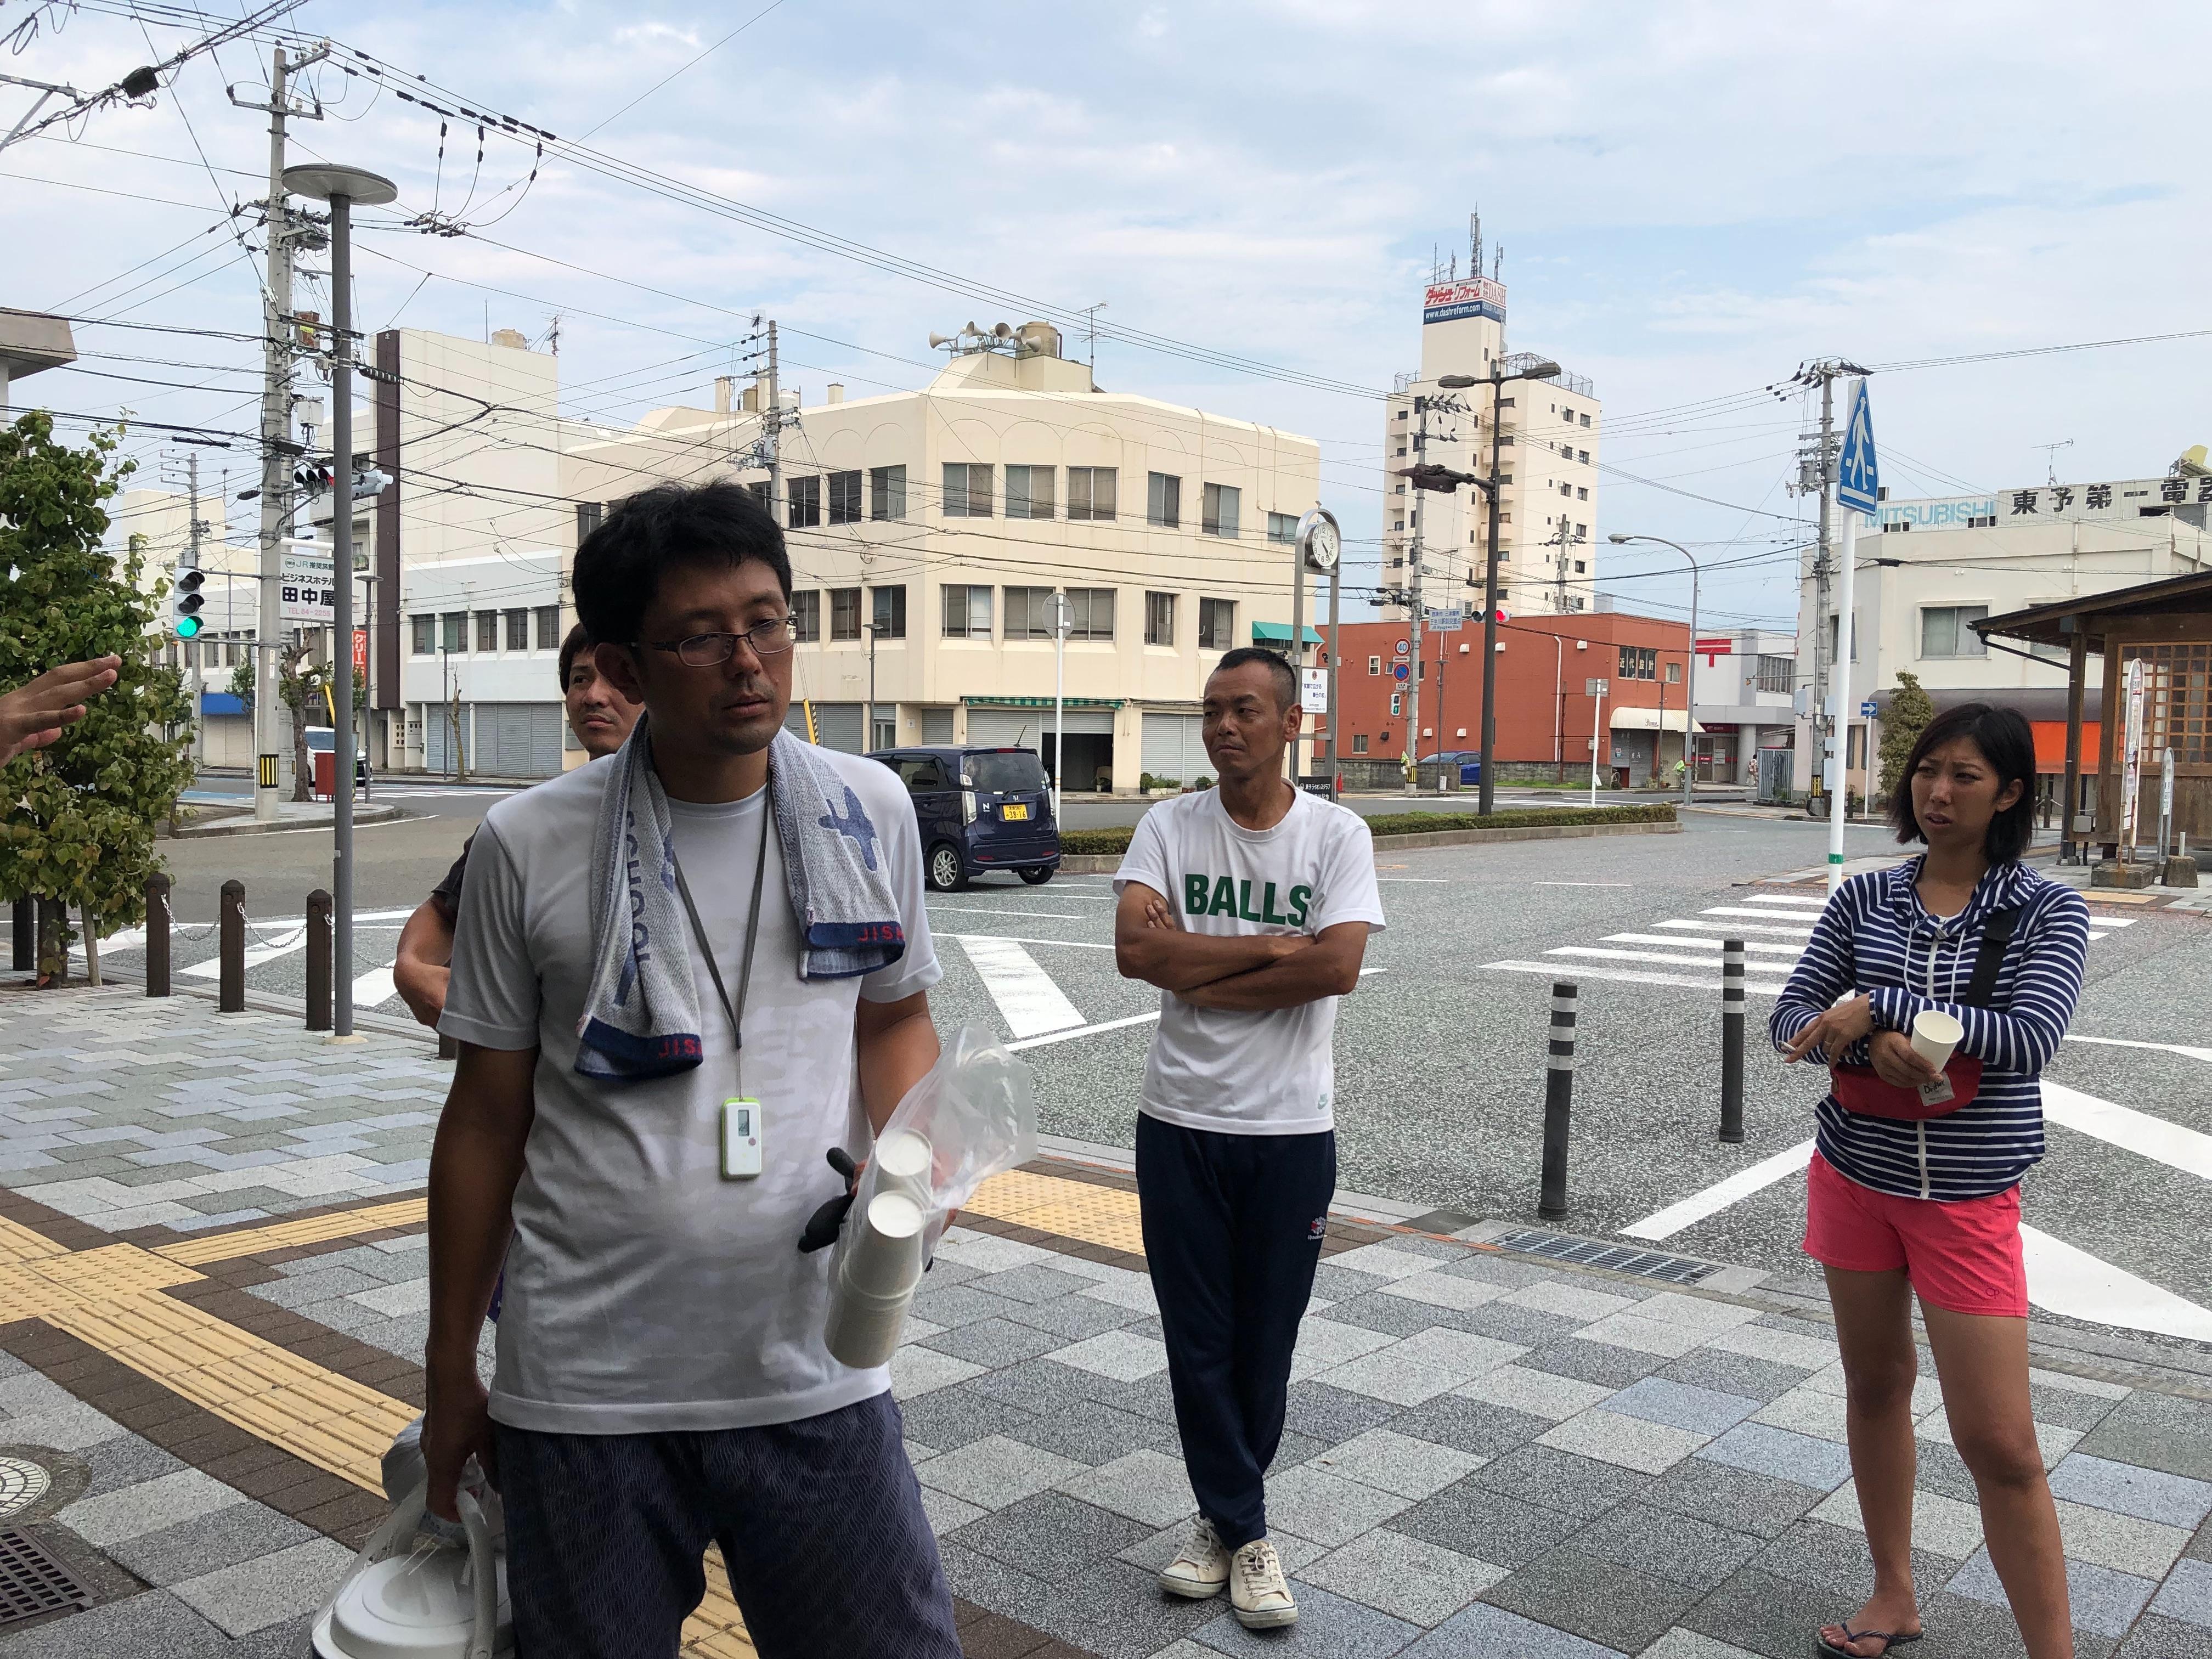 f:id:masanori-kato1972:20190818202527j:image